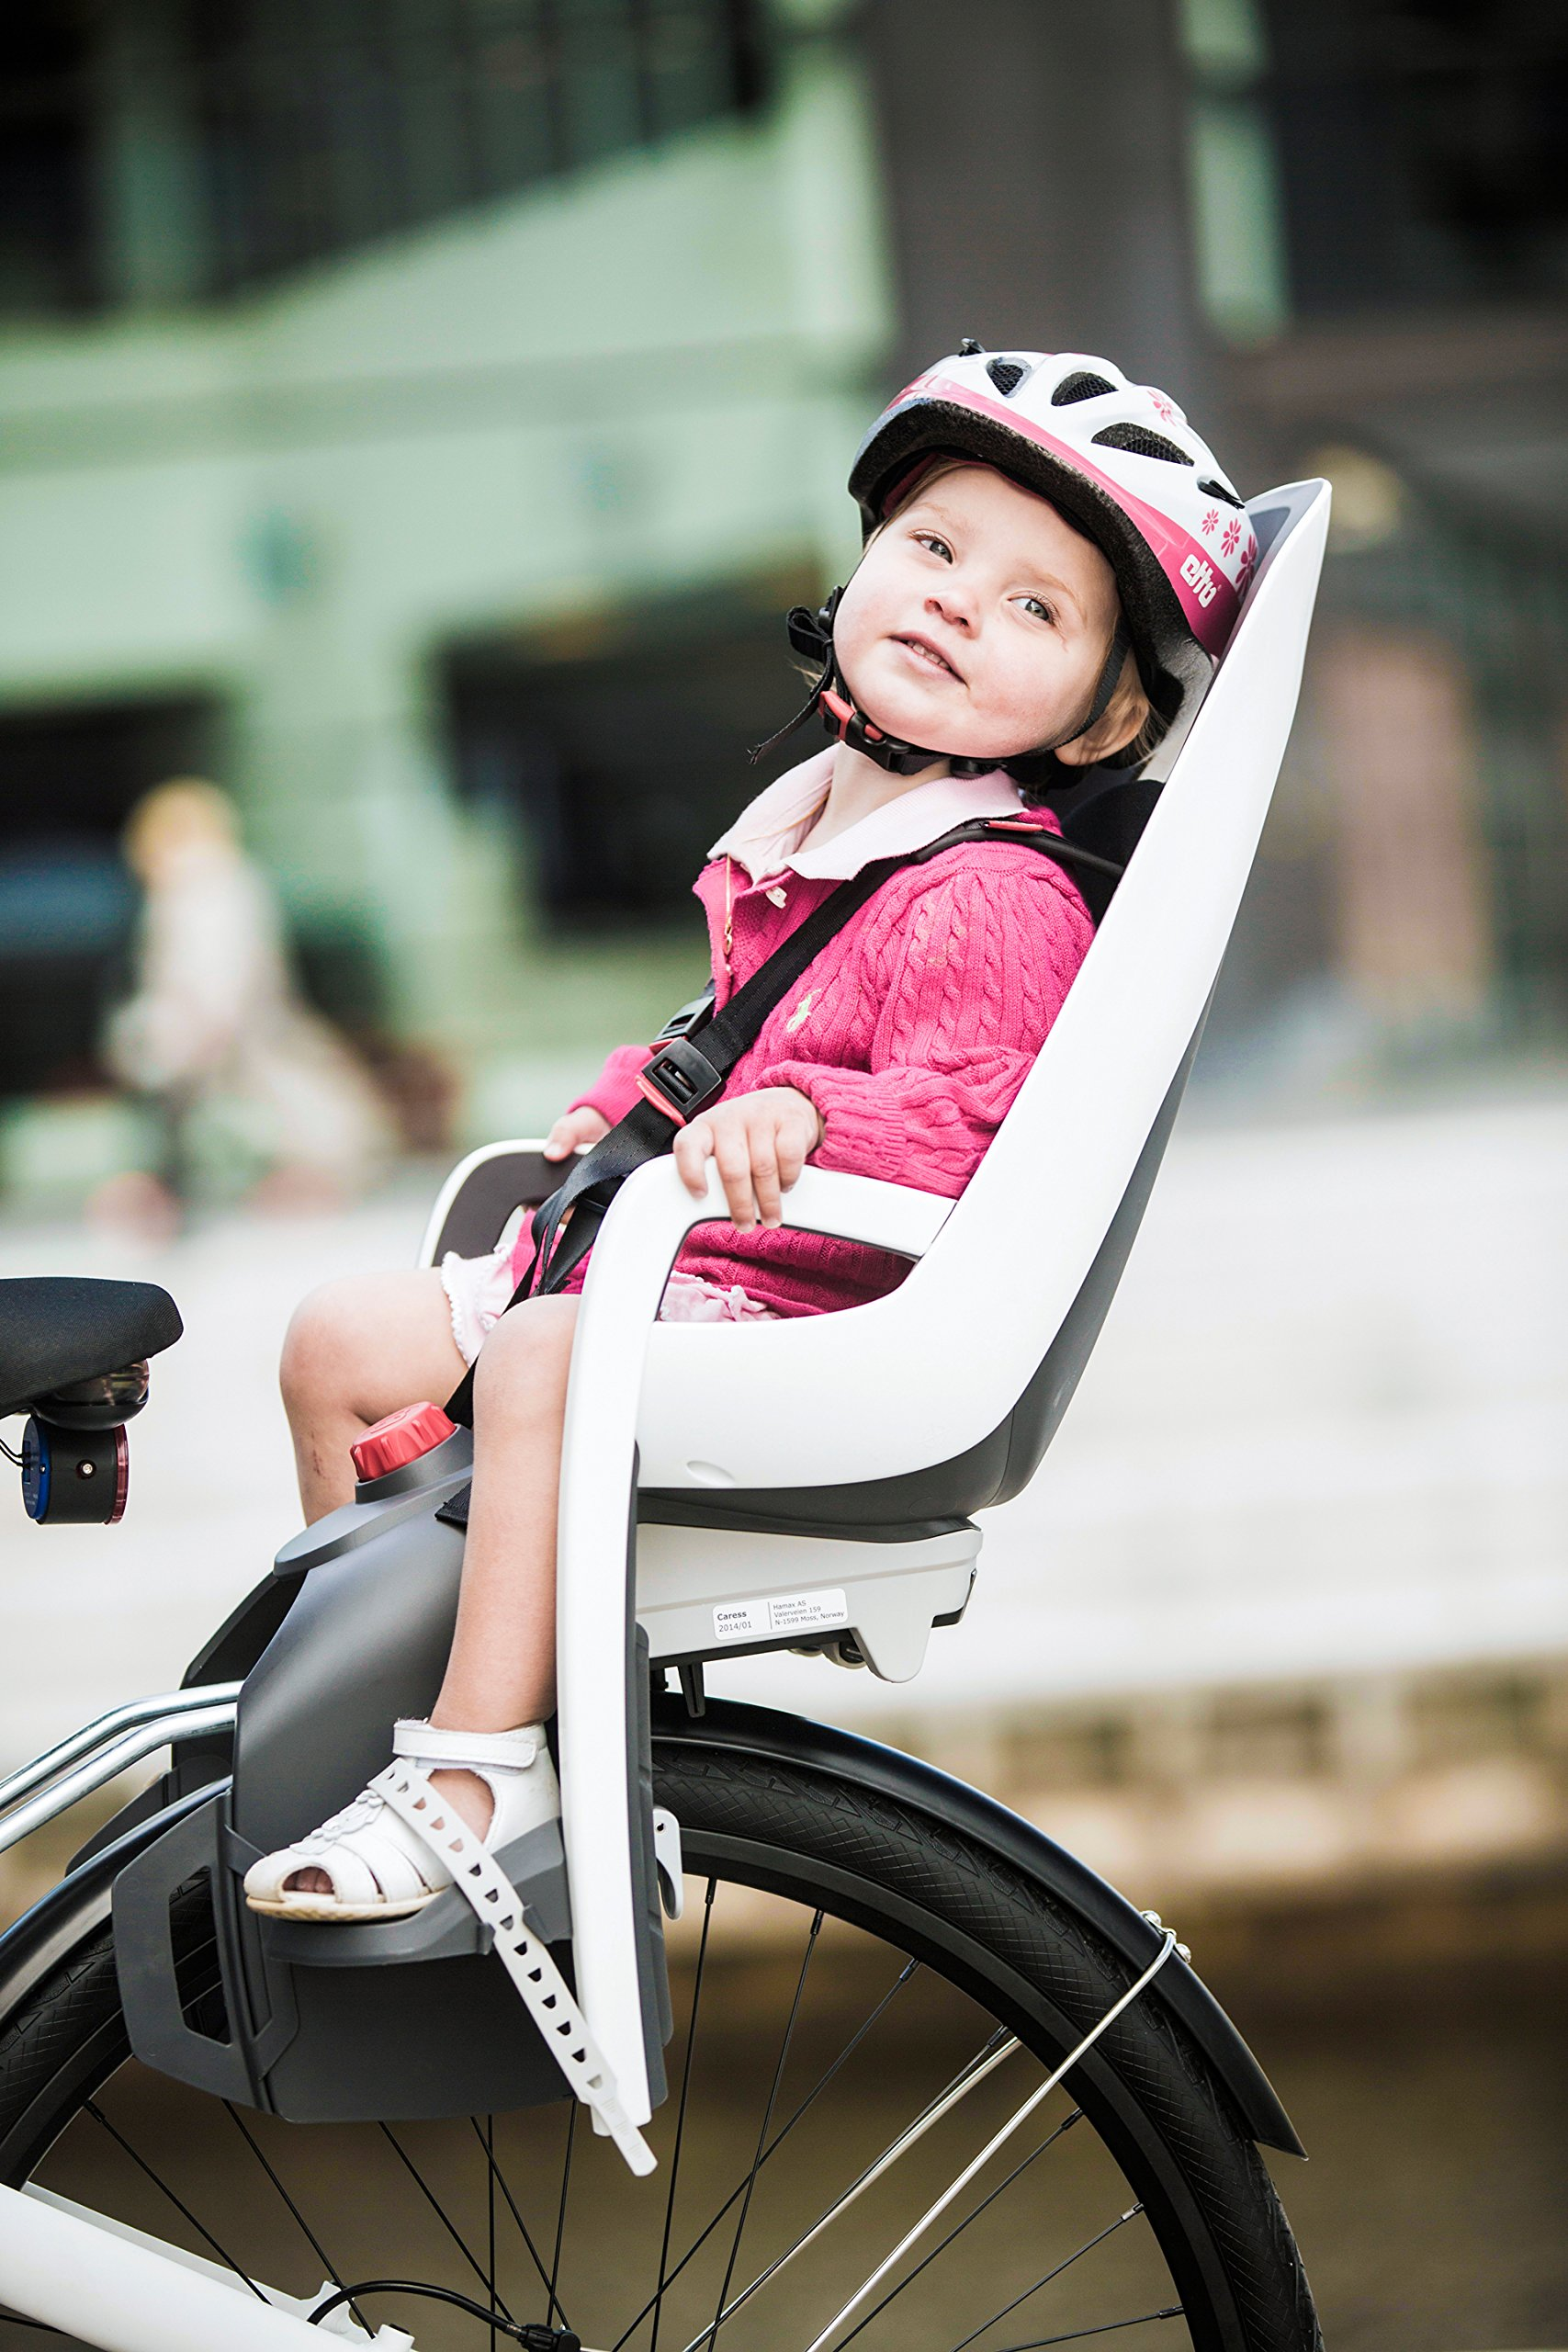 Hamax Caress Rear Child Bike Seat (Grey/White, Frame Mount) by Hamax (Image #4)